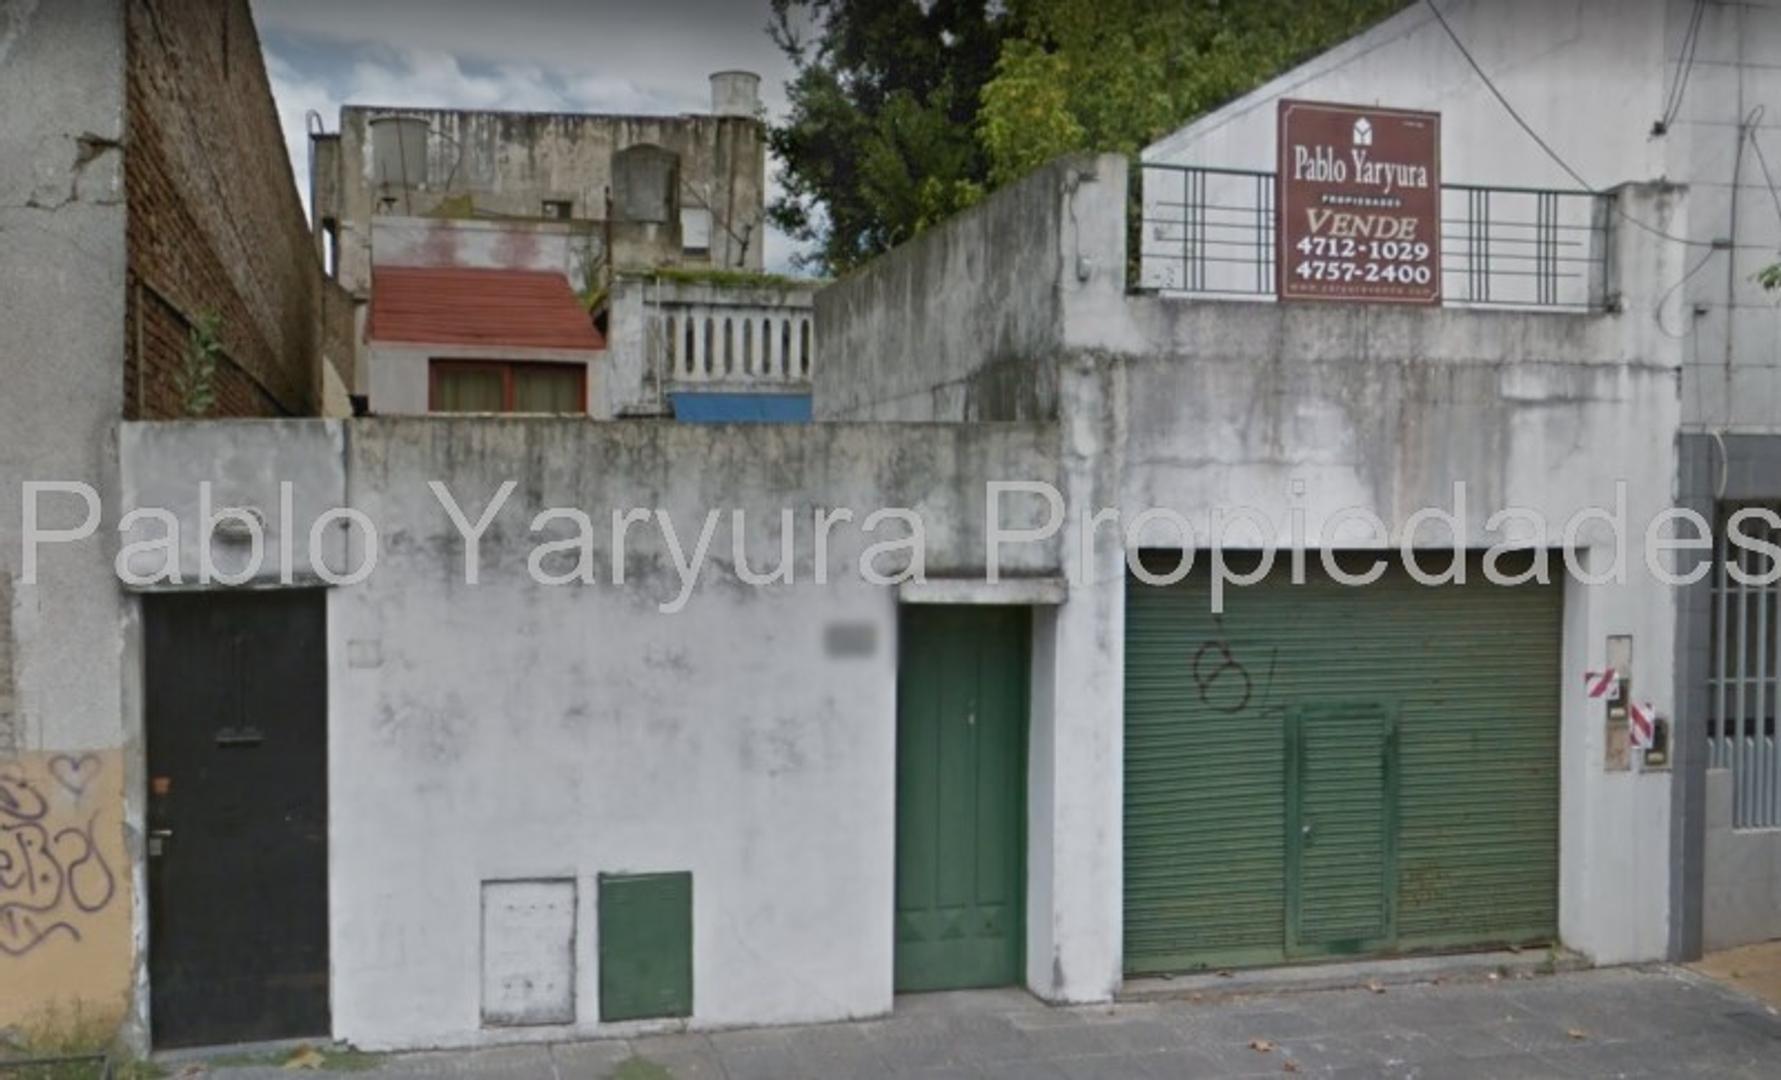 XINTEL(YAR-YAR-14684) Departamento Tipo Casa - Venta - Argentina, General San Martín - SAN LORENZ...